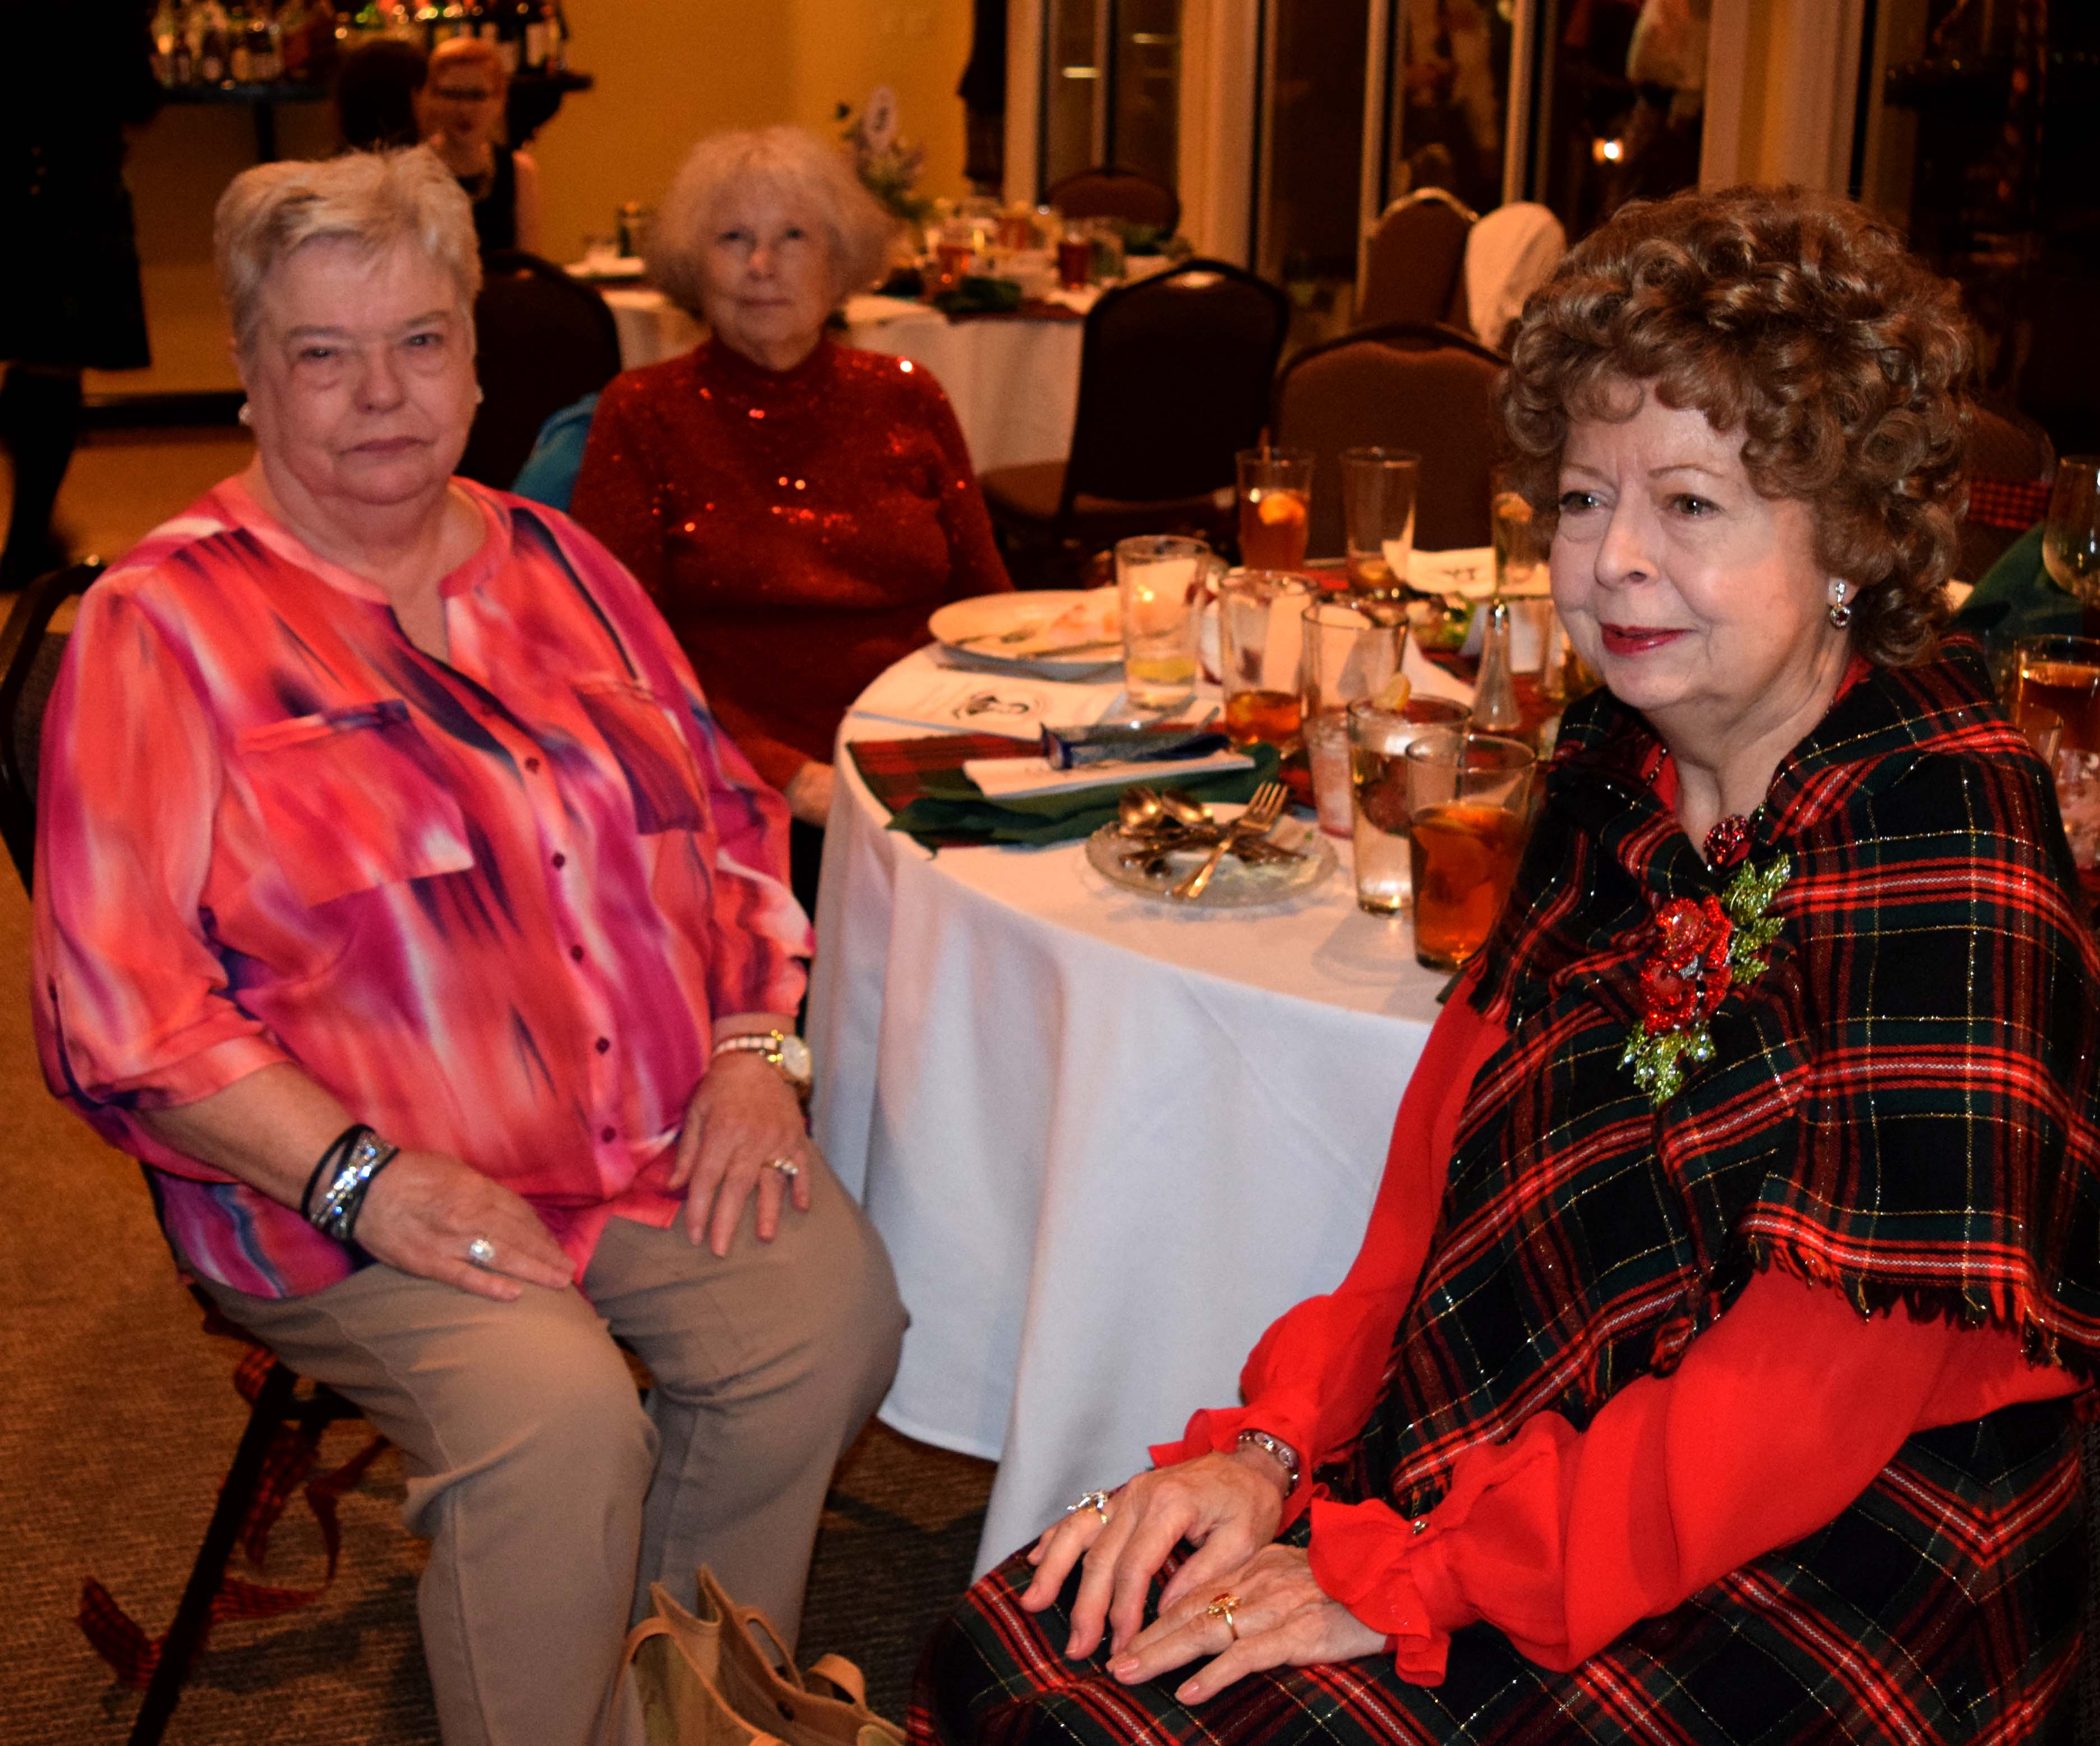 Jeanne Atkins, Marilyn Smitt, Shirley Cobb